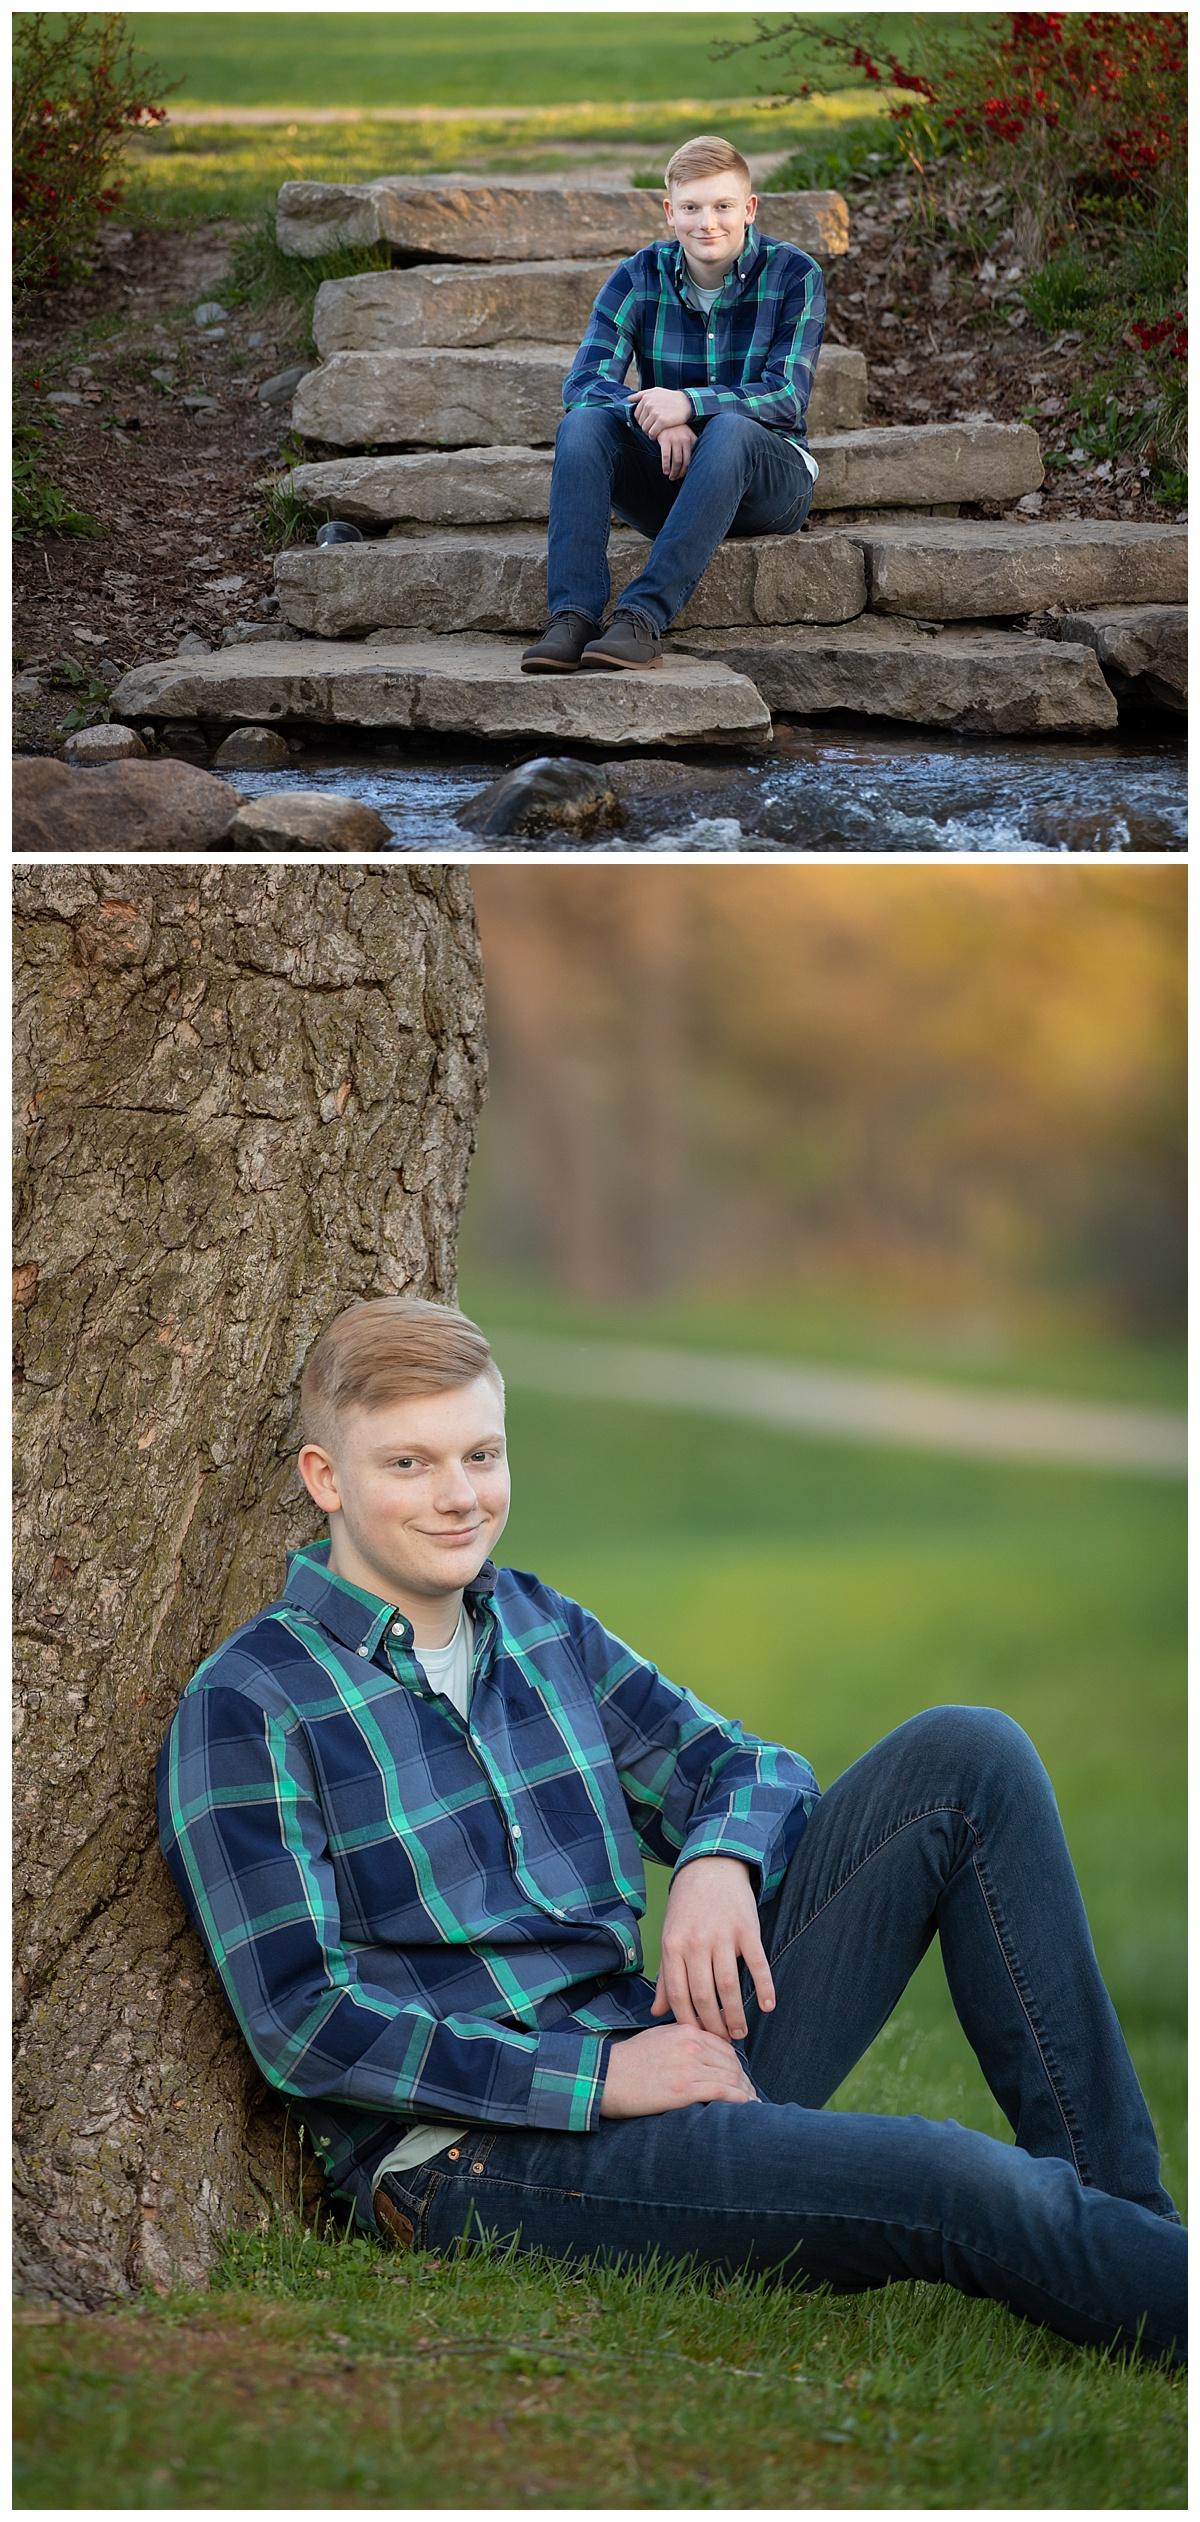 rochester park sernior portraits